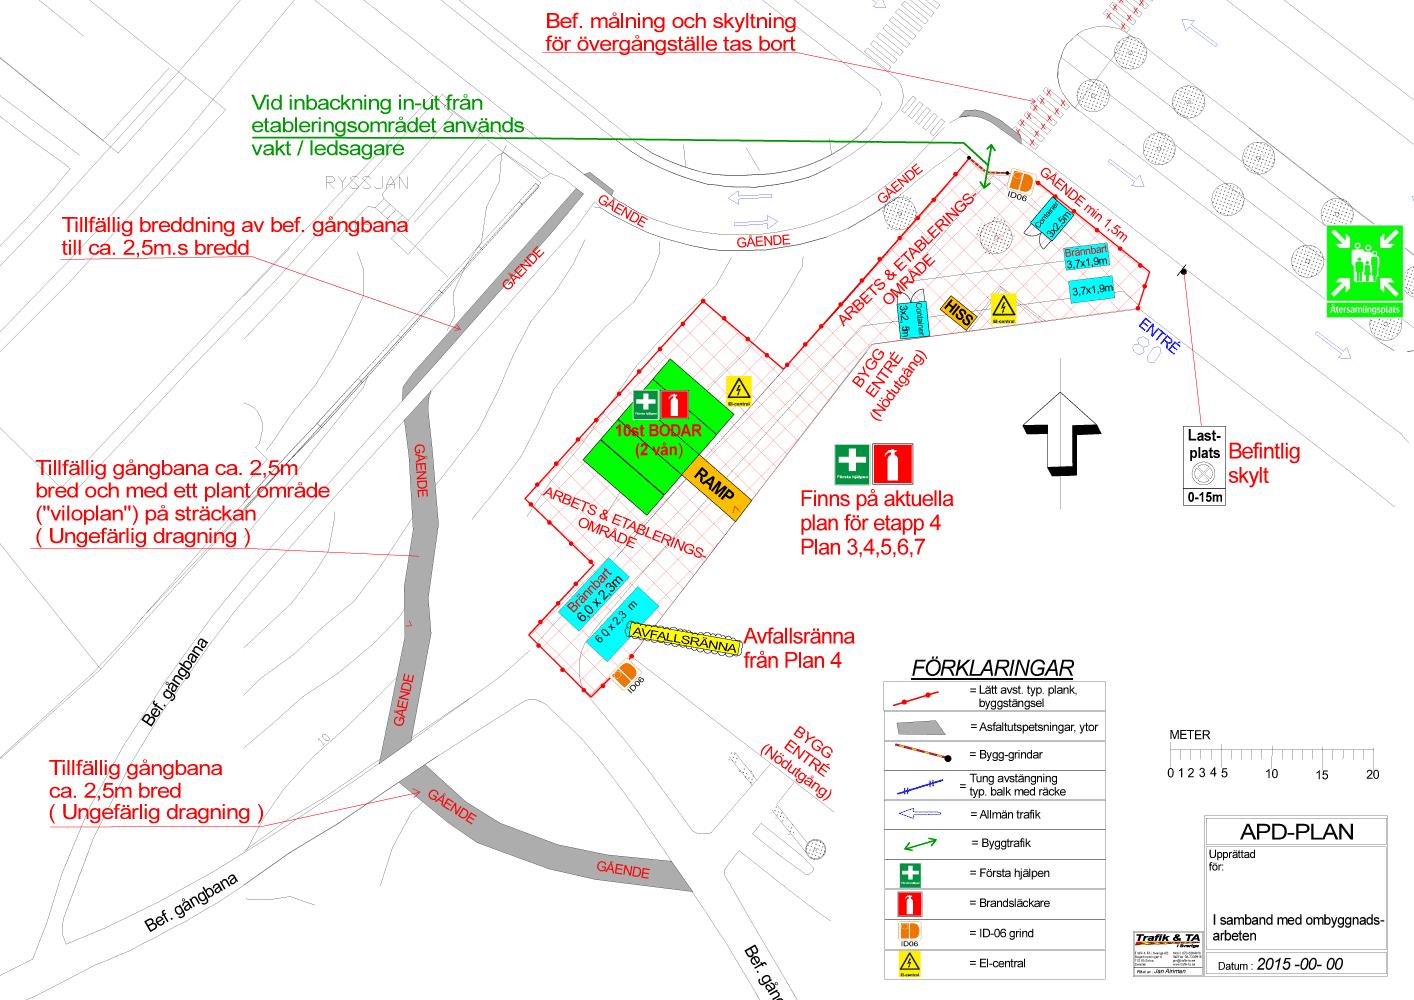 Trafik & TA – APD-planer